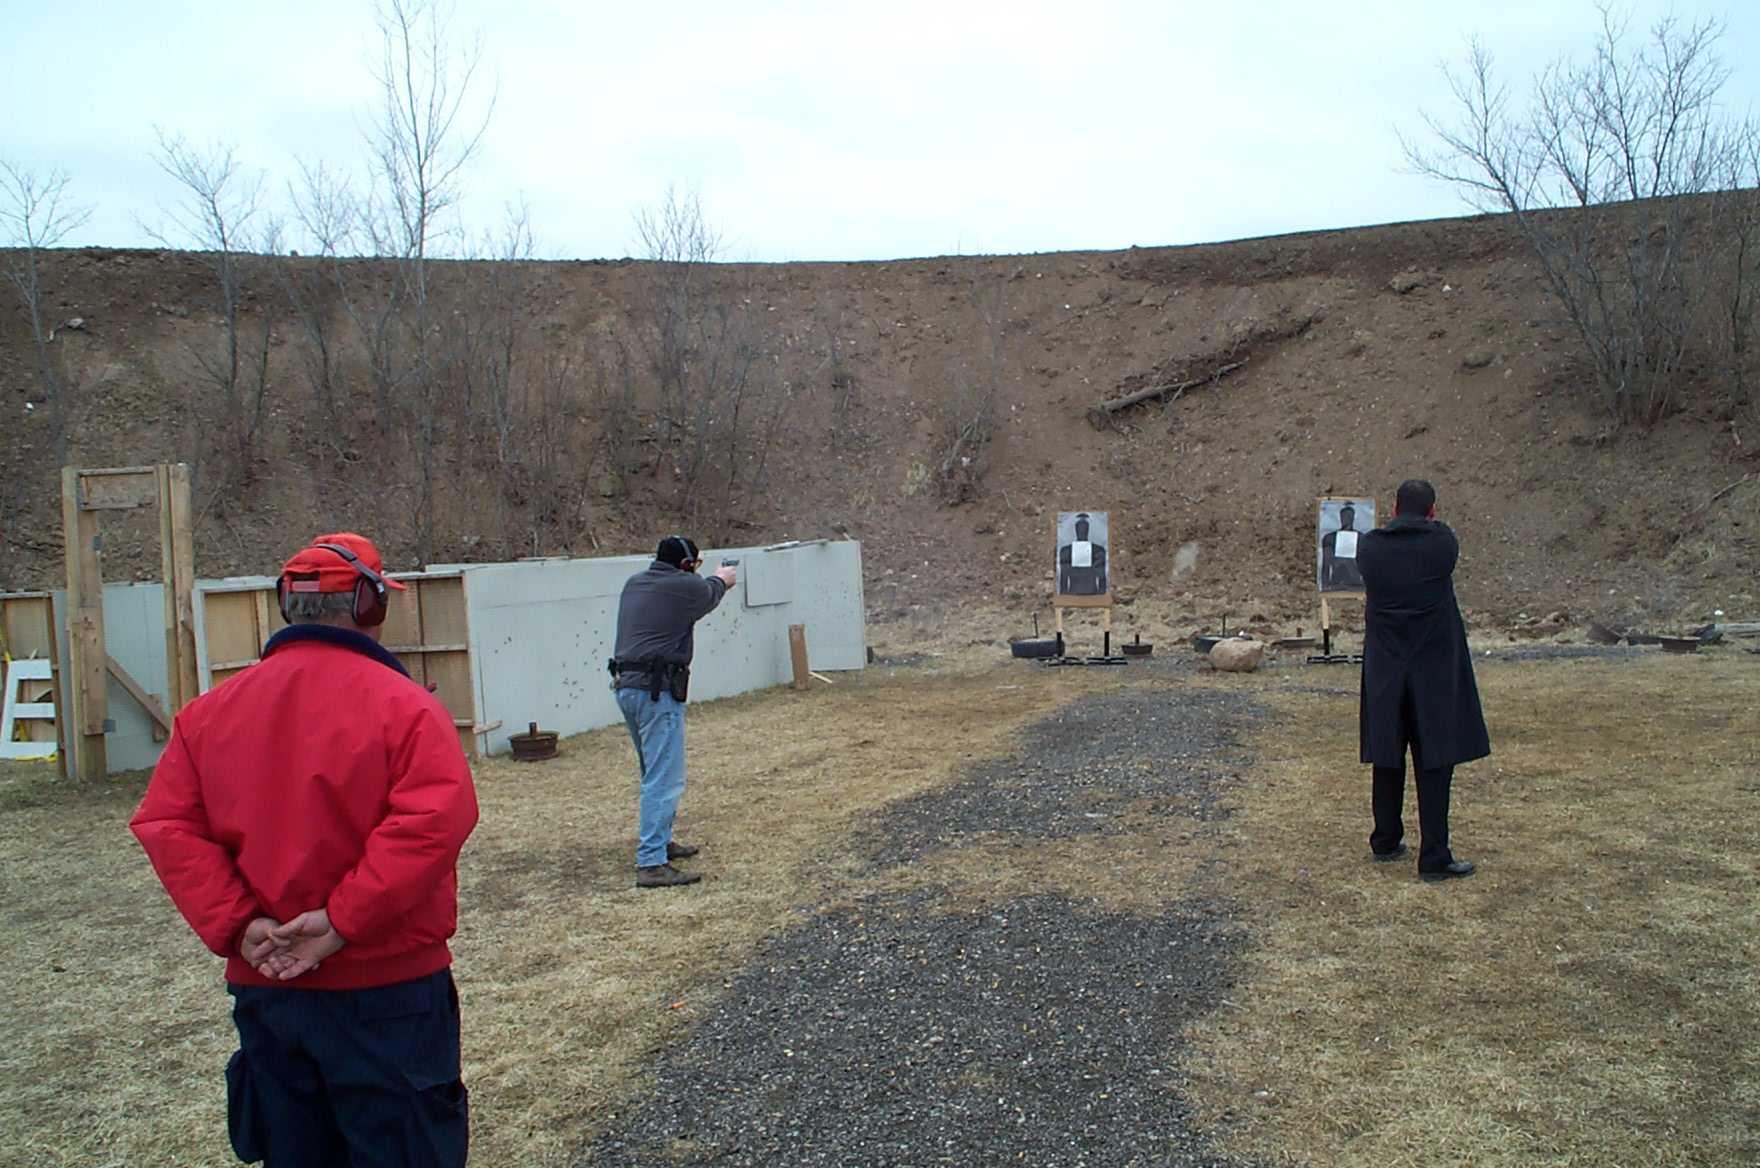 Outdoor shooting range Oxford